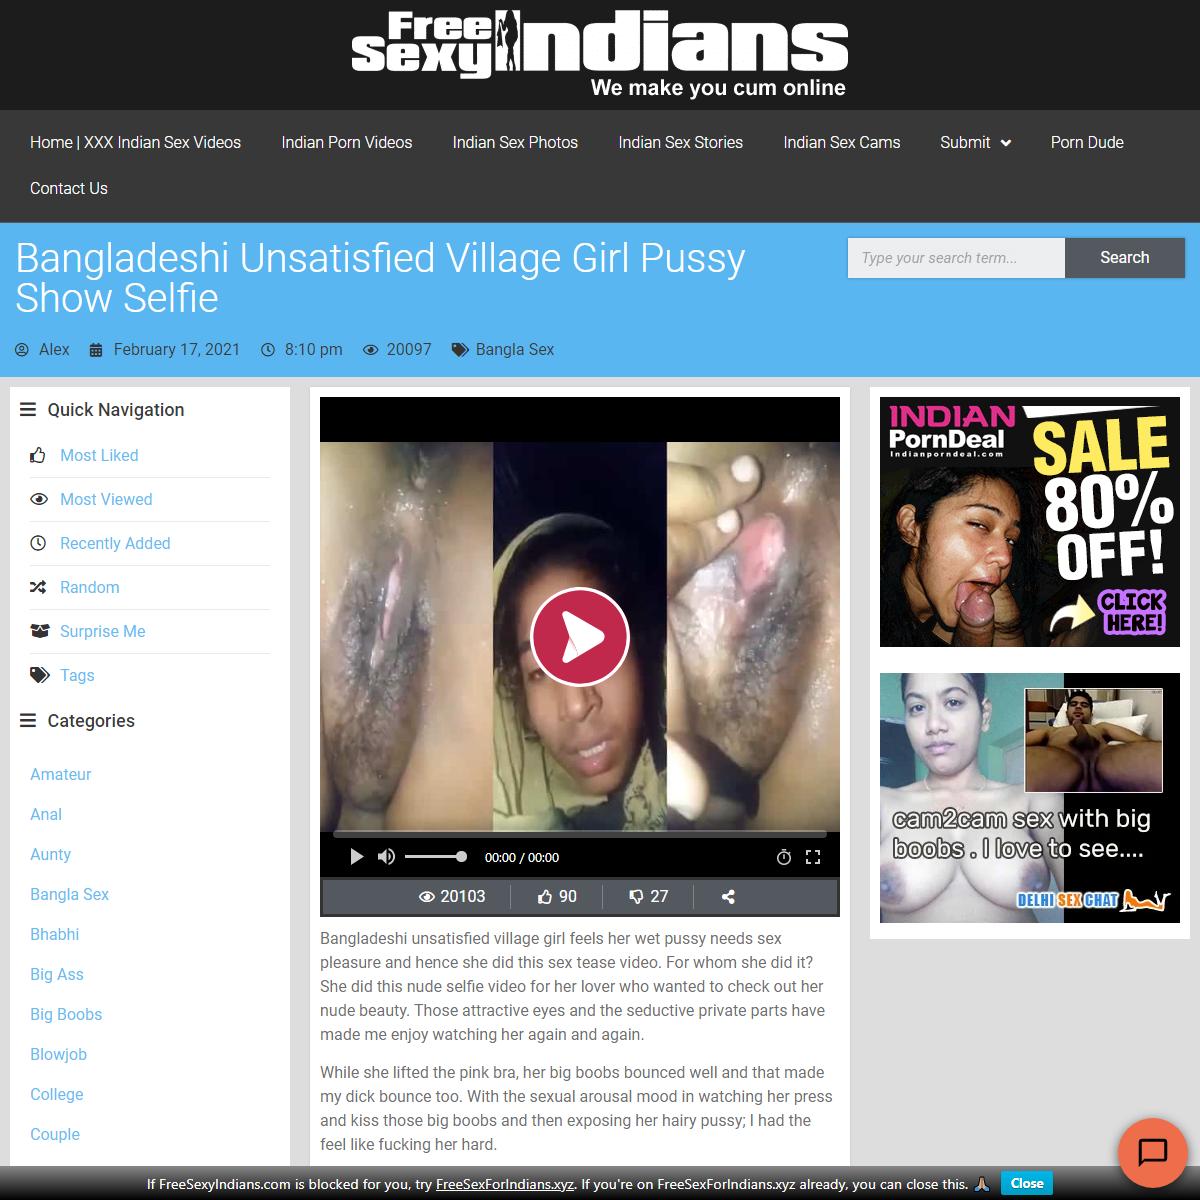 Bangladeshi unsatisfied village girl pussy show selfie - FSI Blog